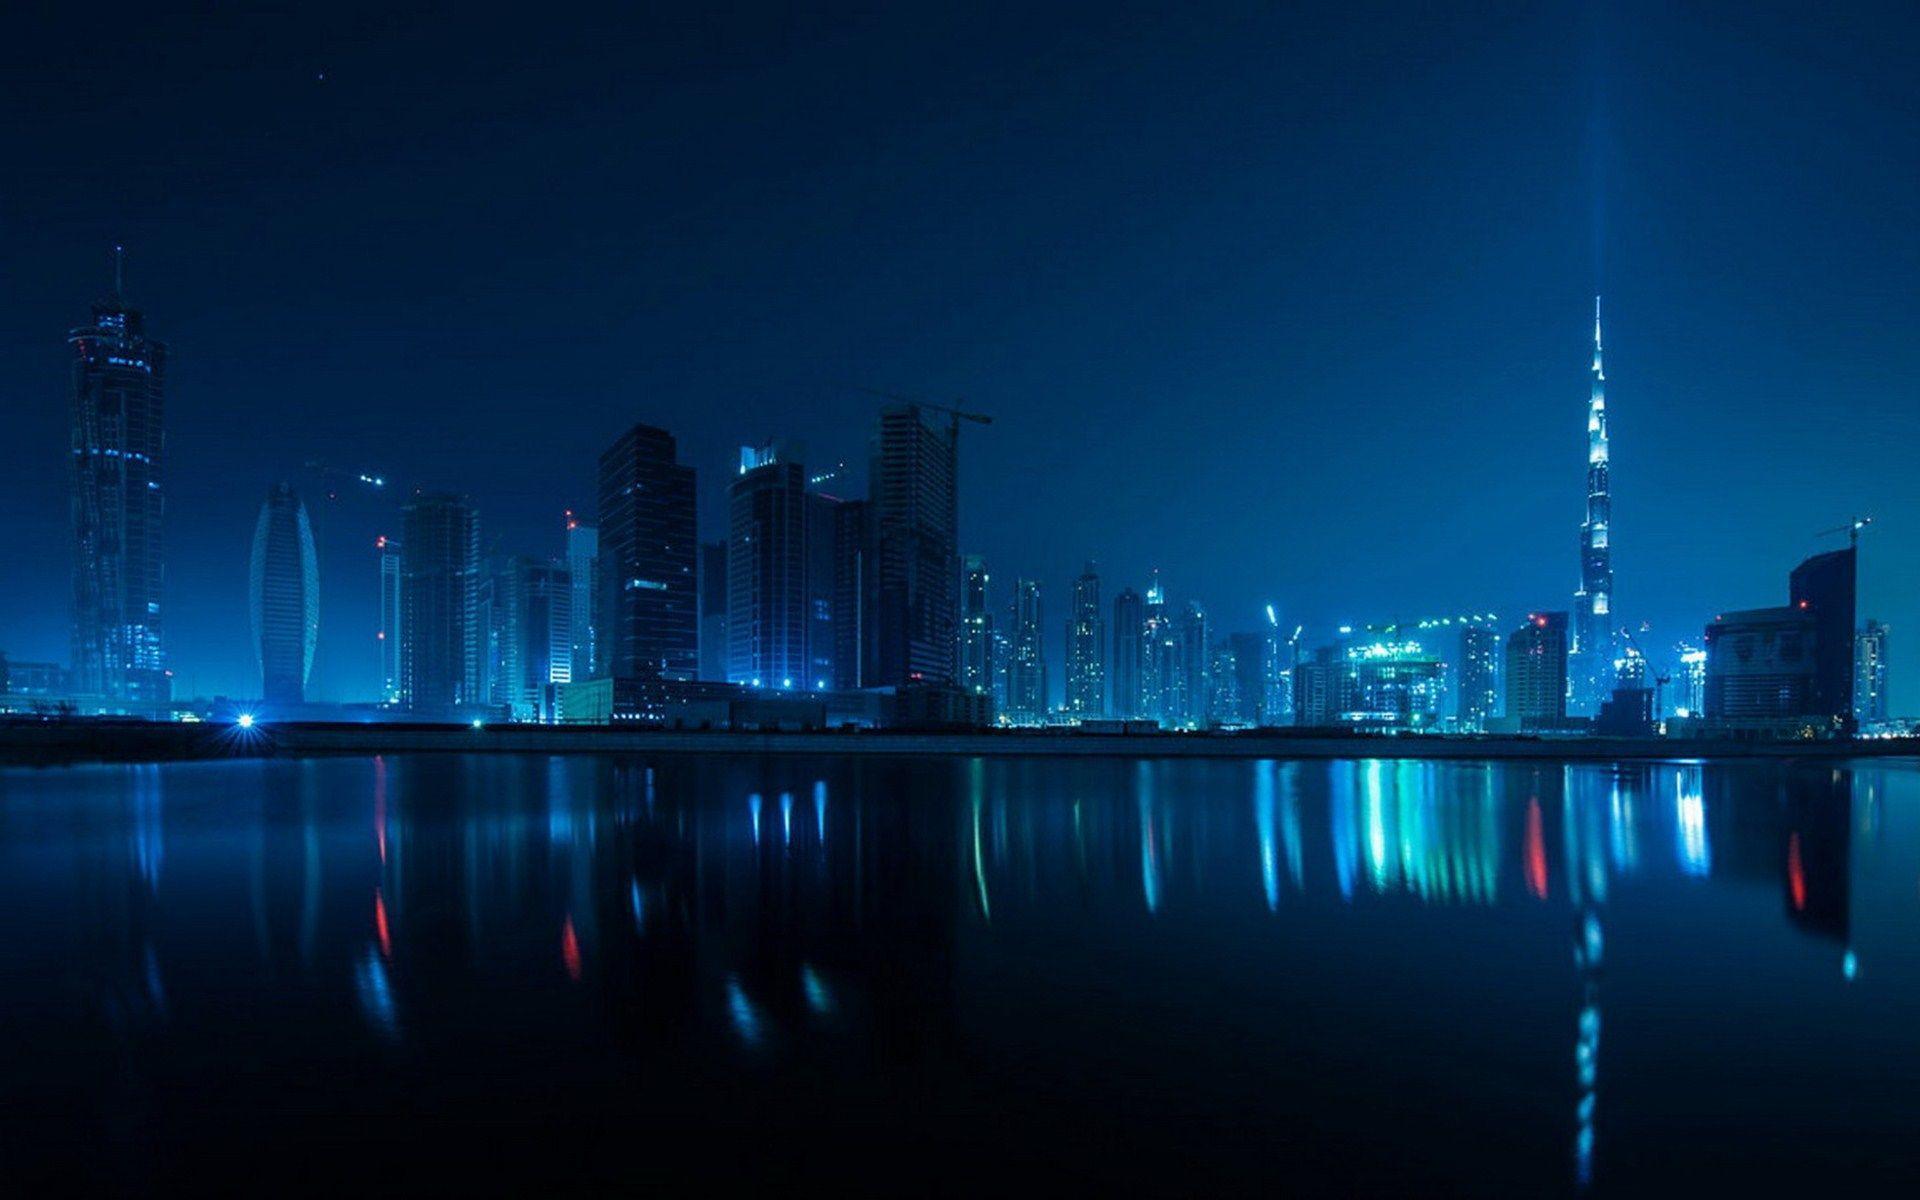 Night Aesthetic Desktop Wallpapers Top Free Night